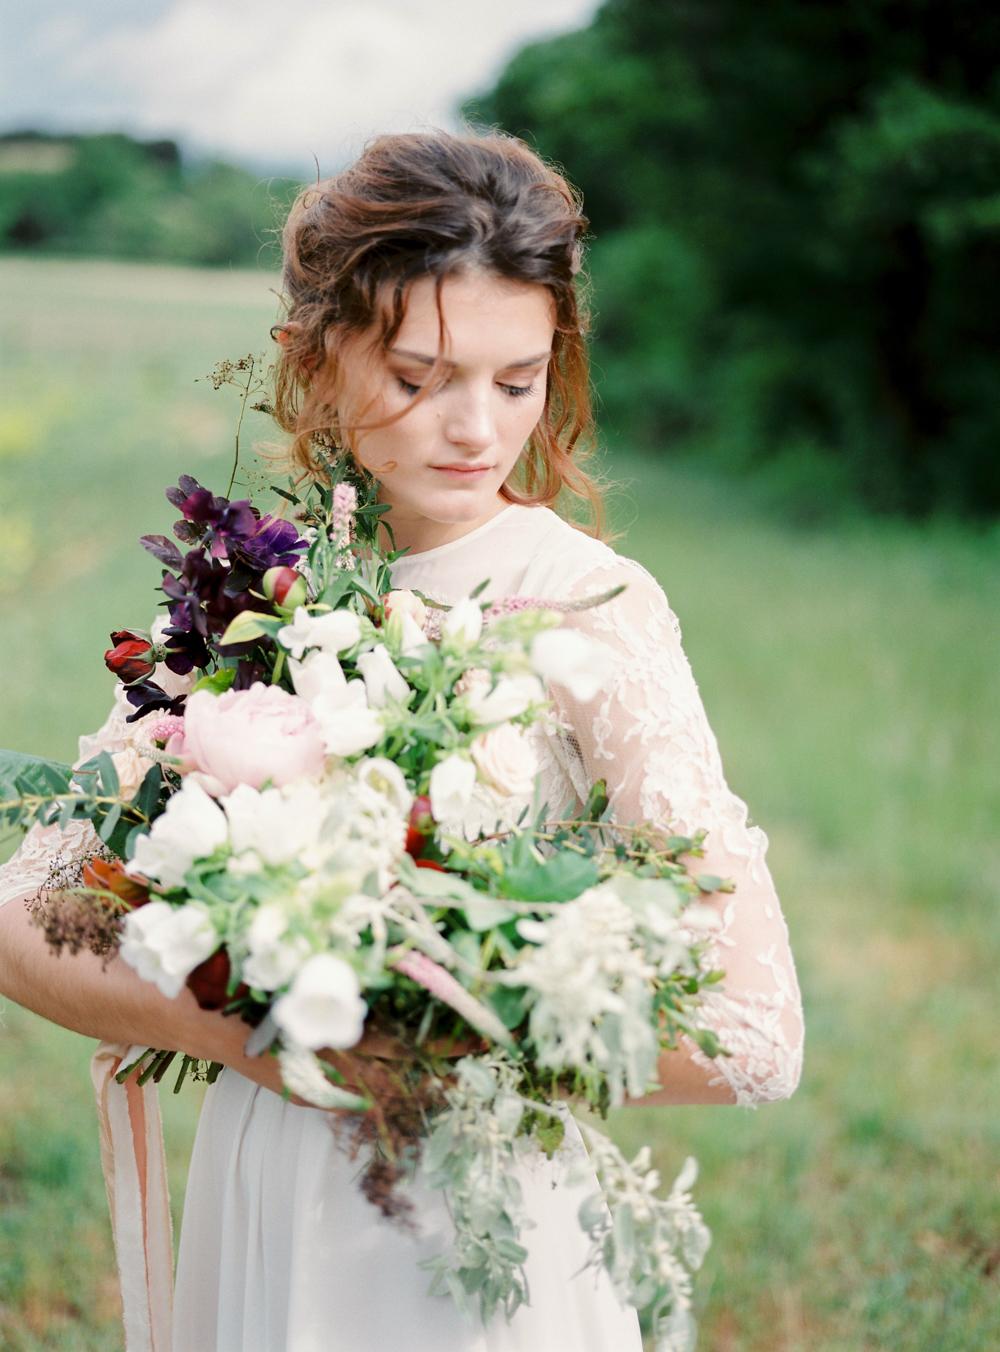 celine_chhuon_photography_Provence_Bride51.jpg